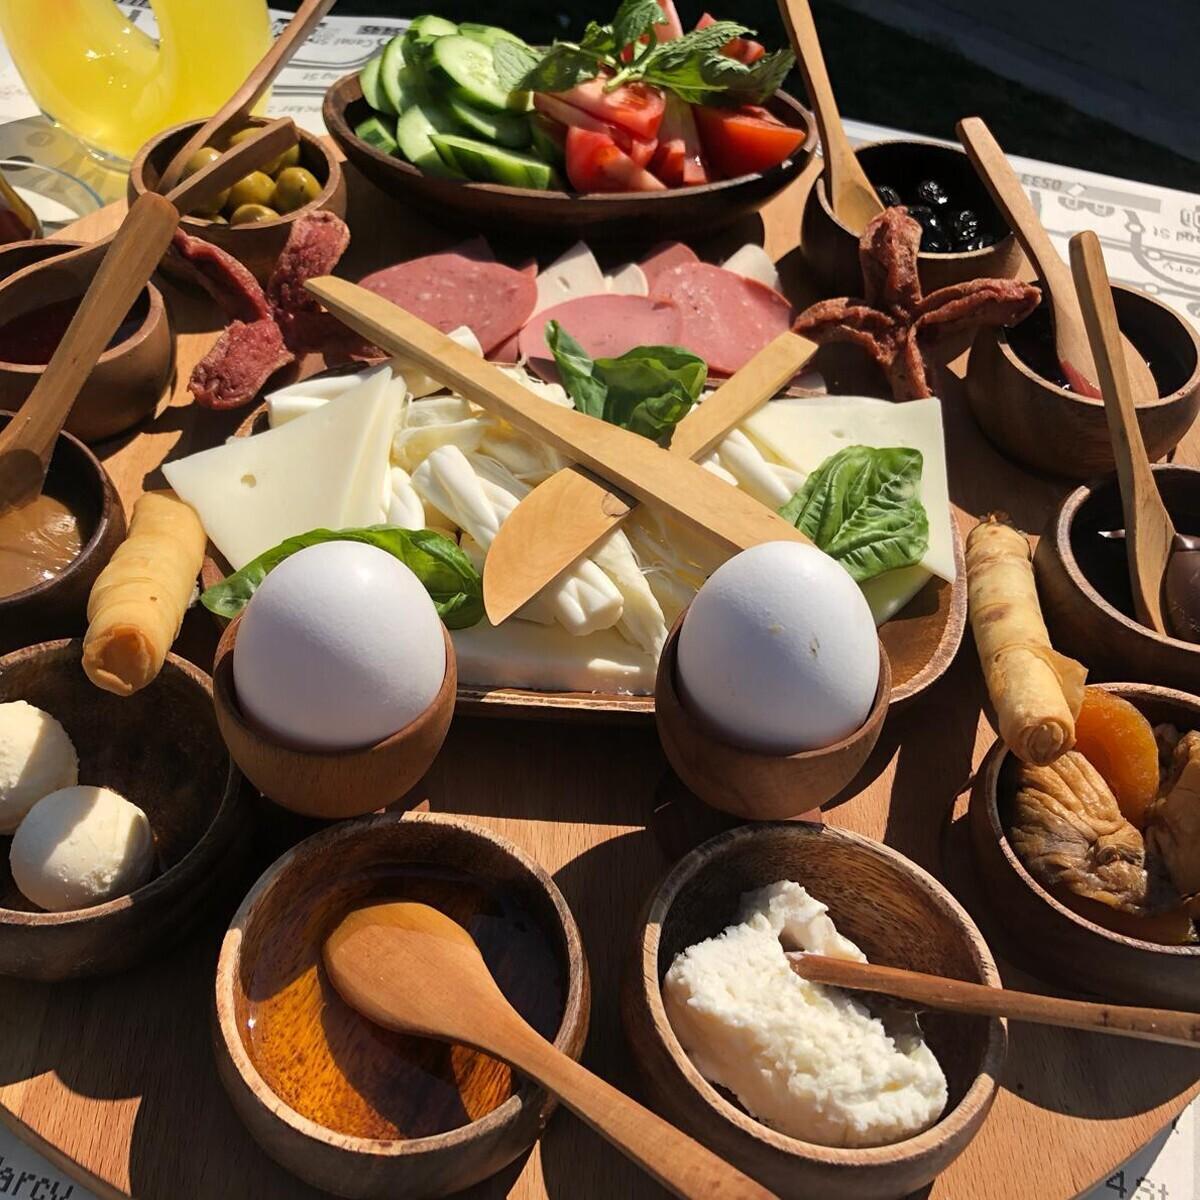 Hollywood City Lounge'dan Nefis Mi Nefis Kahvaltı Seçenekleri